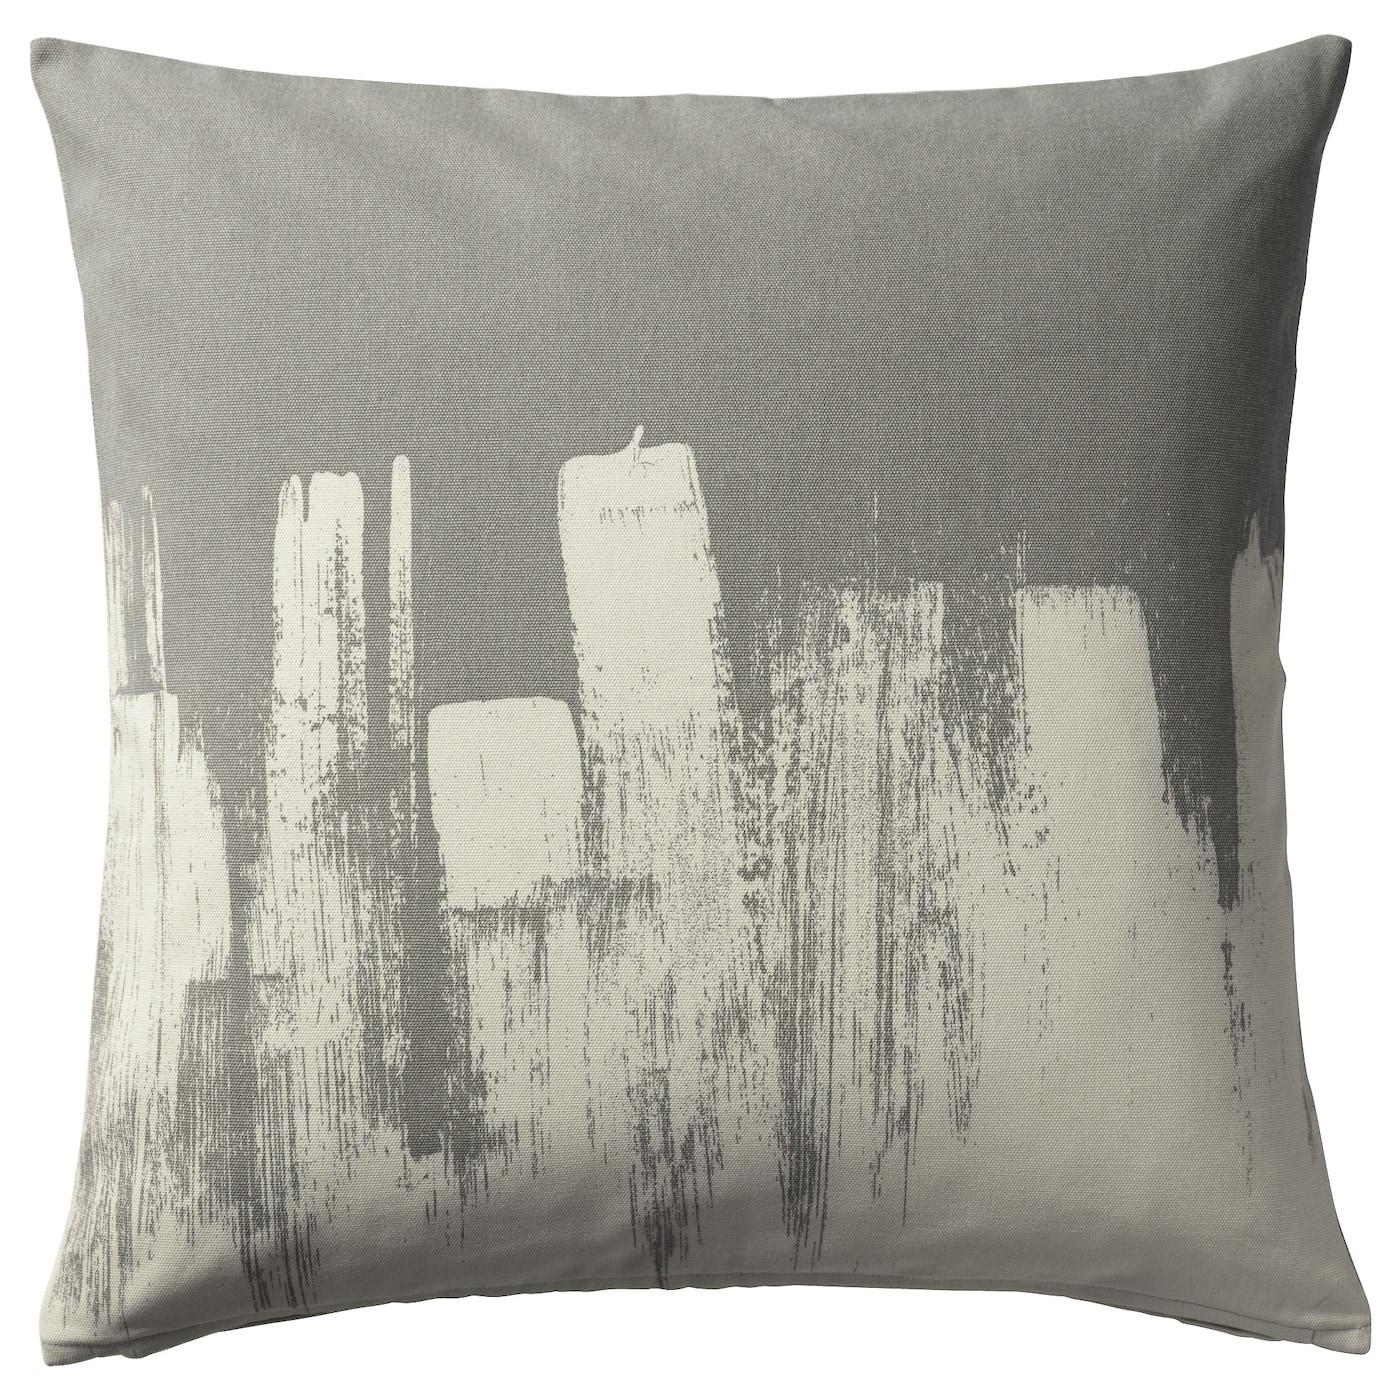 GURLI Cushion cover Grey 50x50 cm IKEA